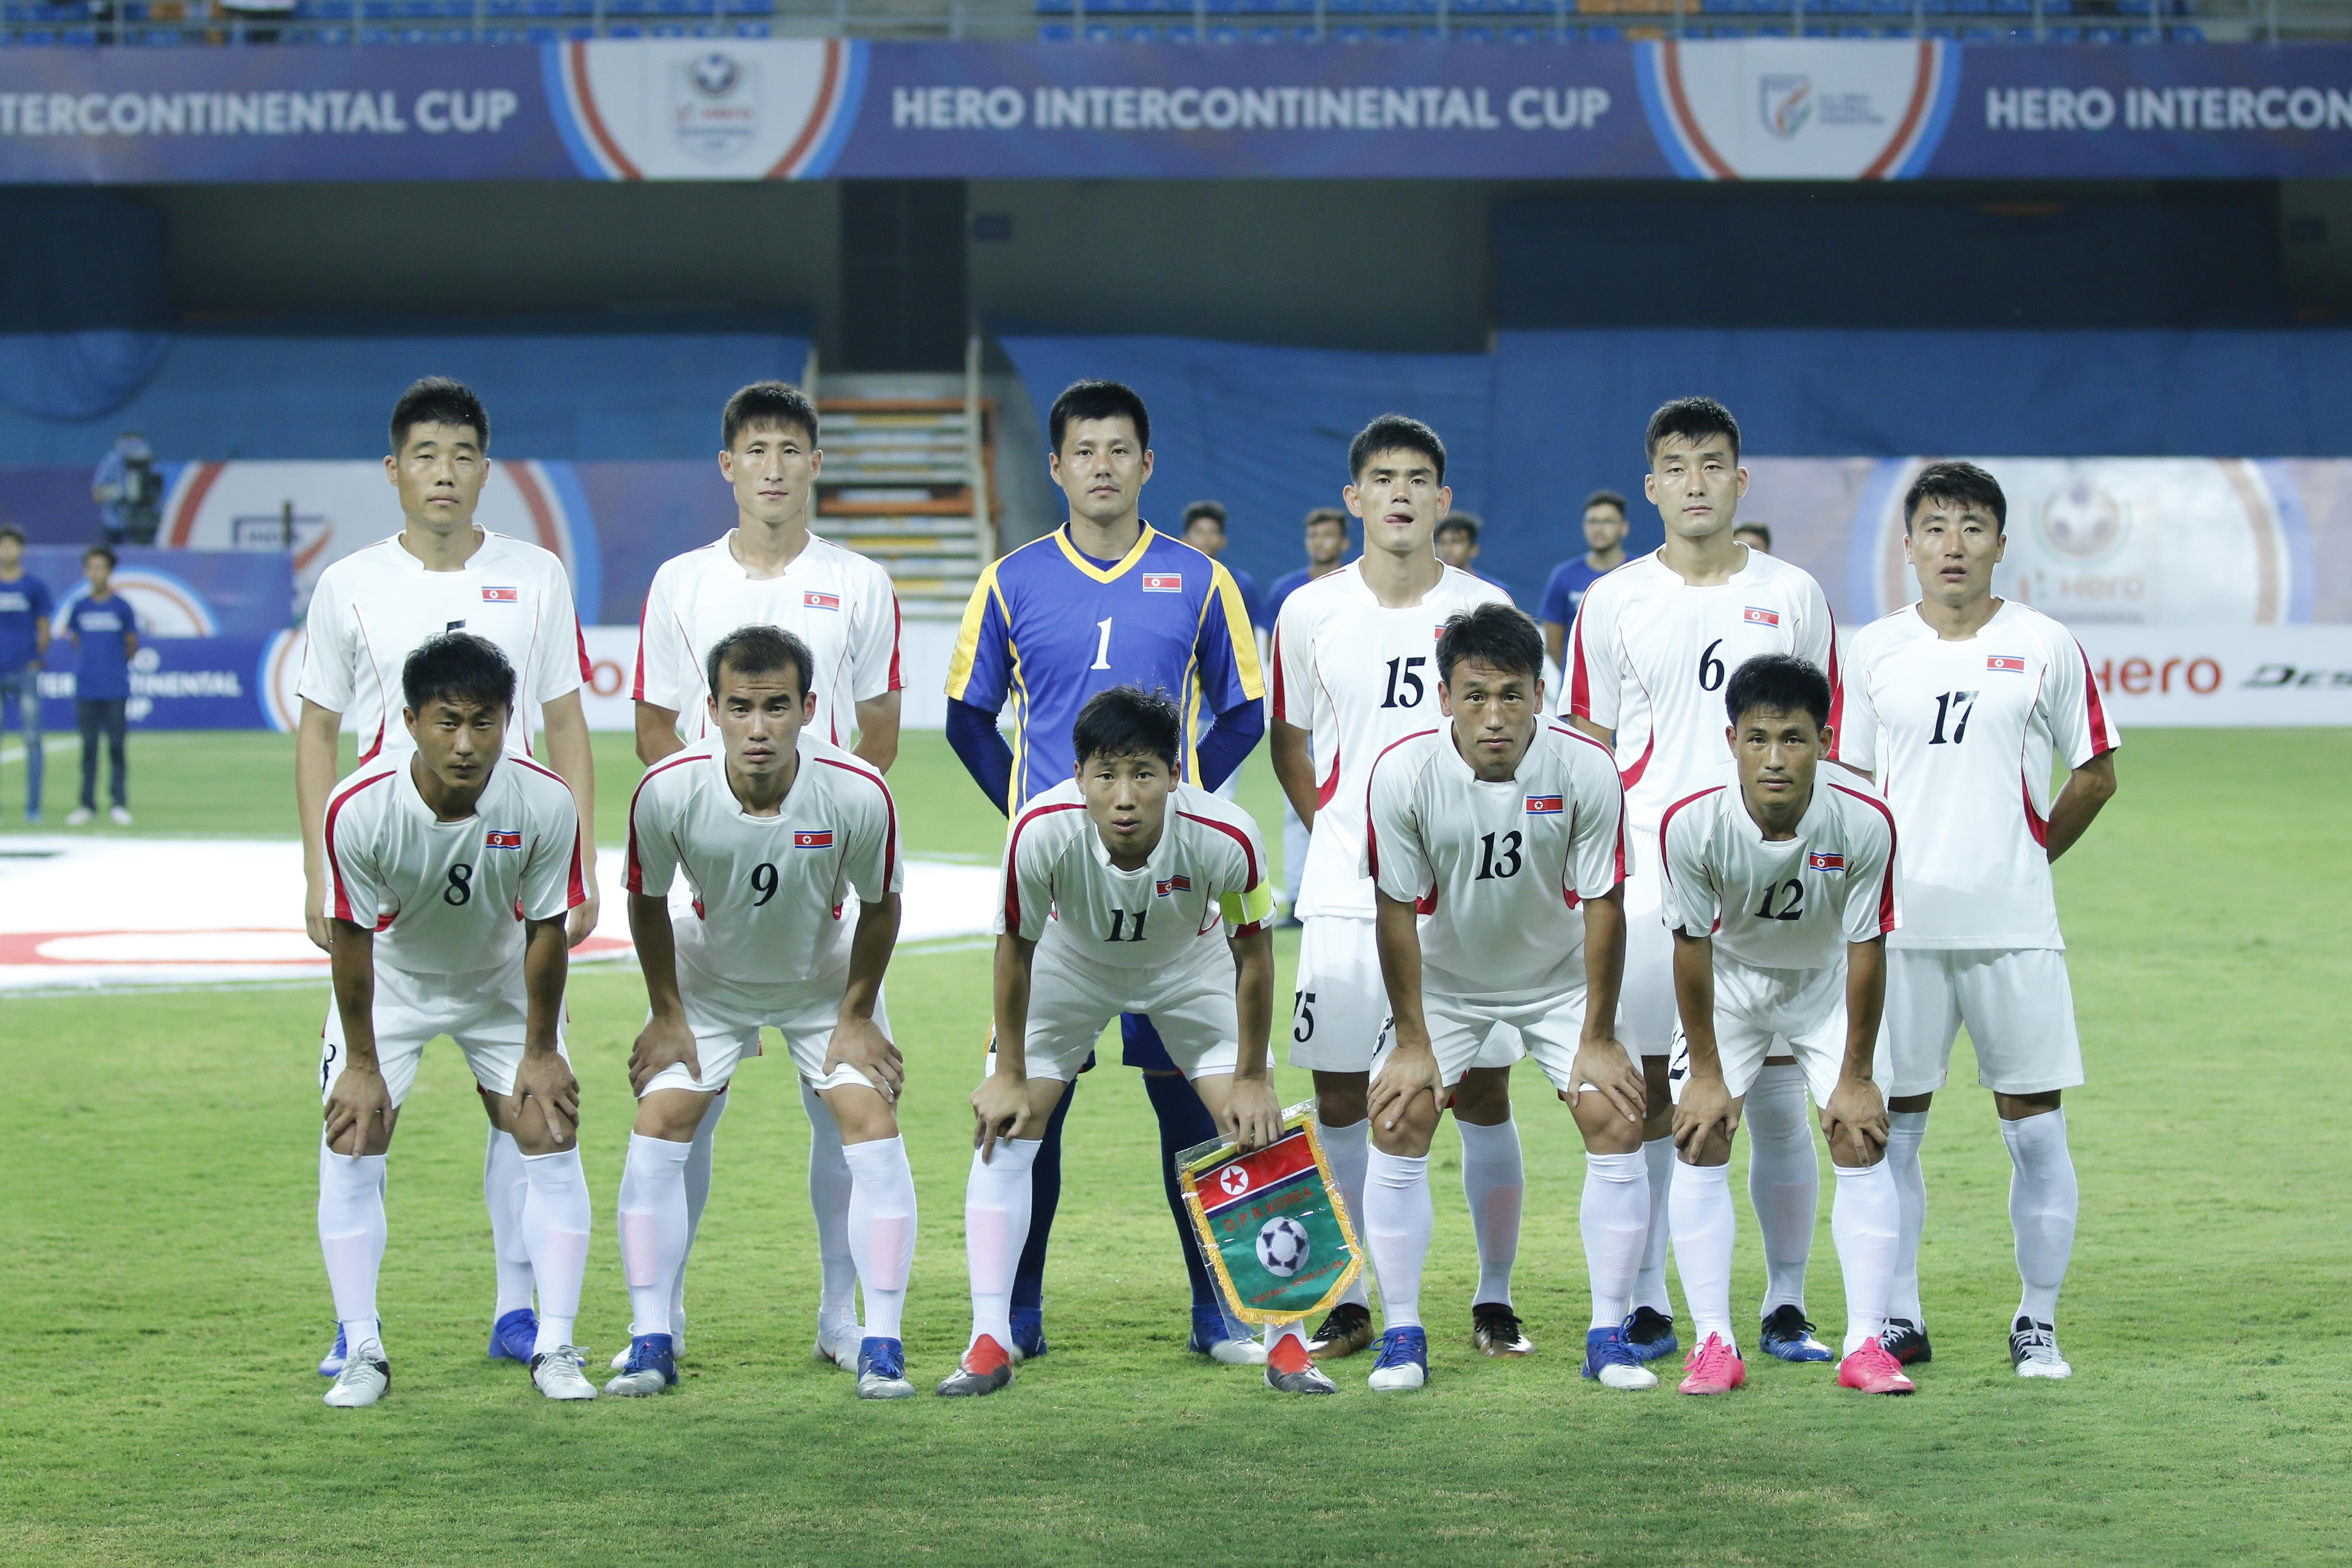 North Korea Football Team InterContinental Cup 2019